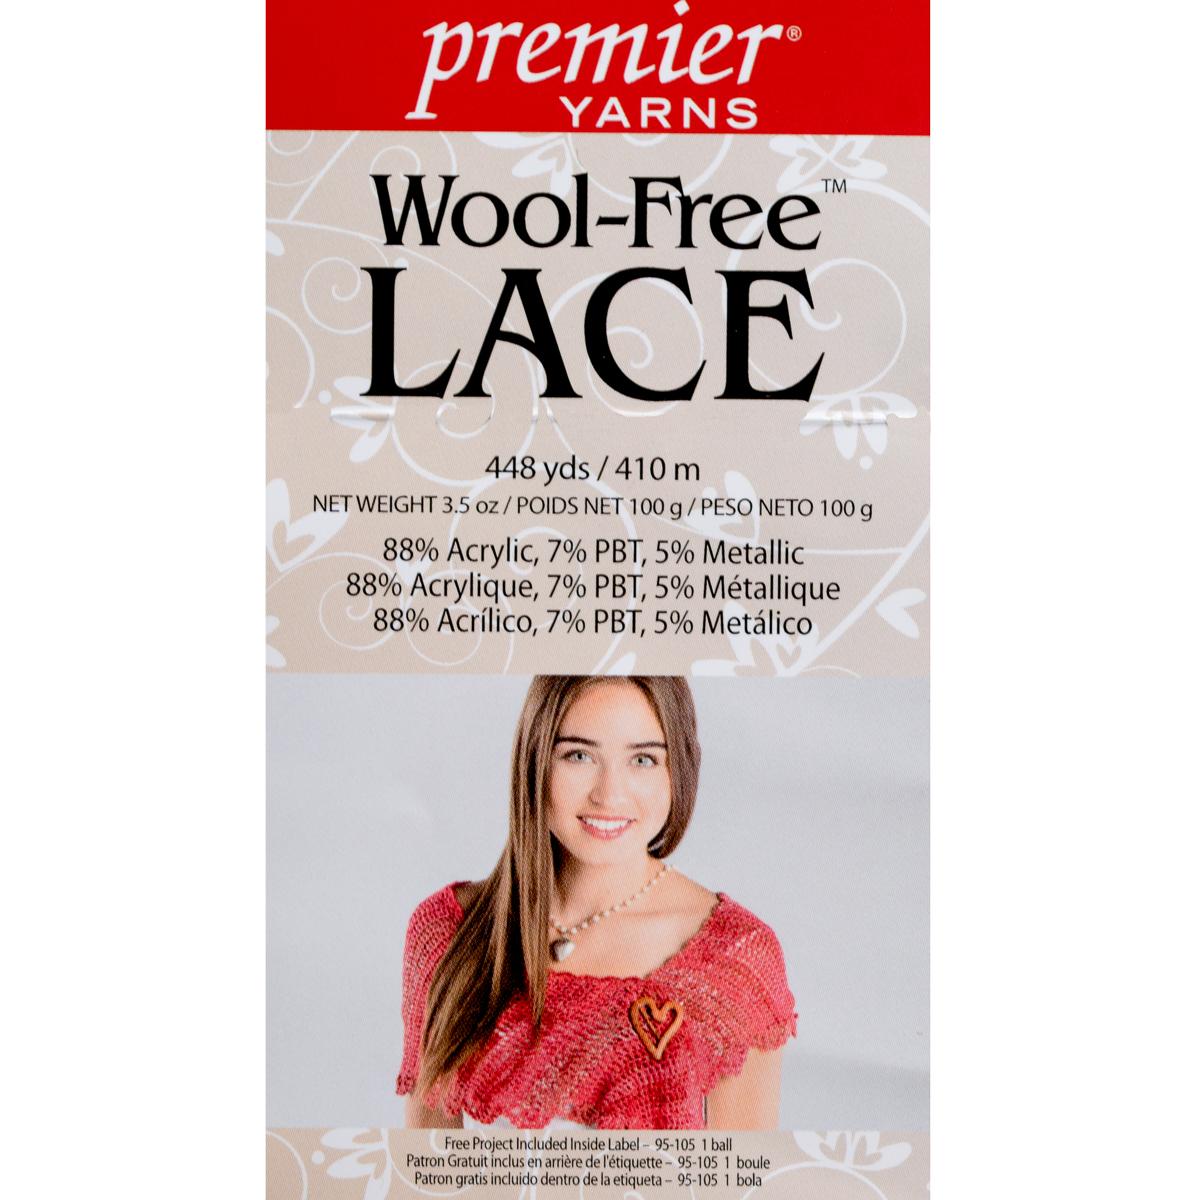 3pk-Premier-Yarns-Wool-Free-Lace-Acrylic-Yarn-Super-Fine-1-Knitting-Skeins-Soft thumbnail 13